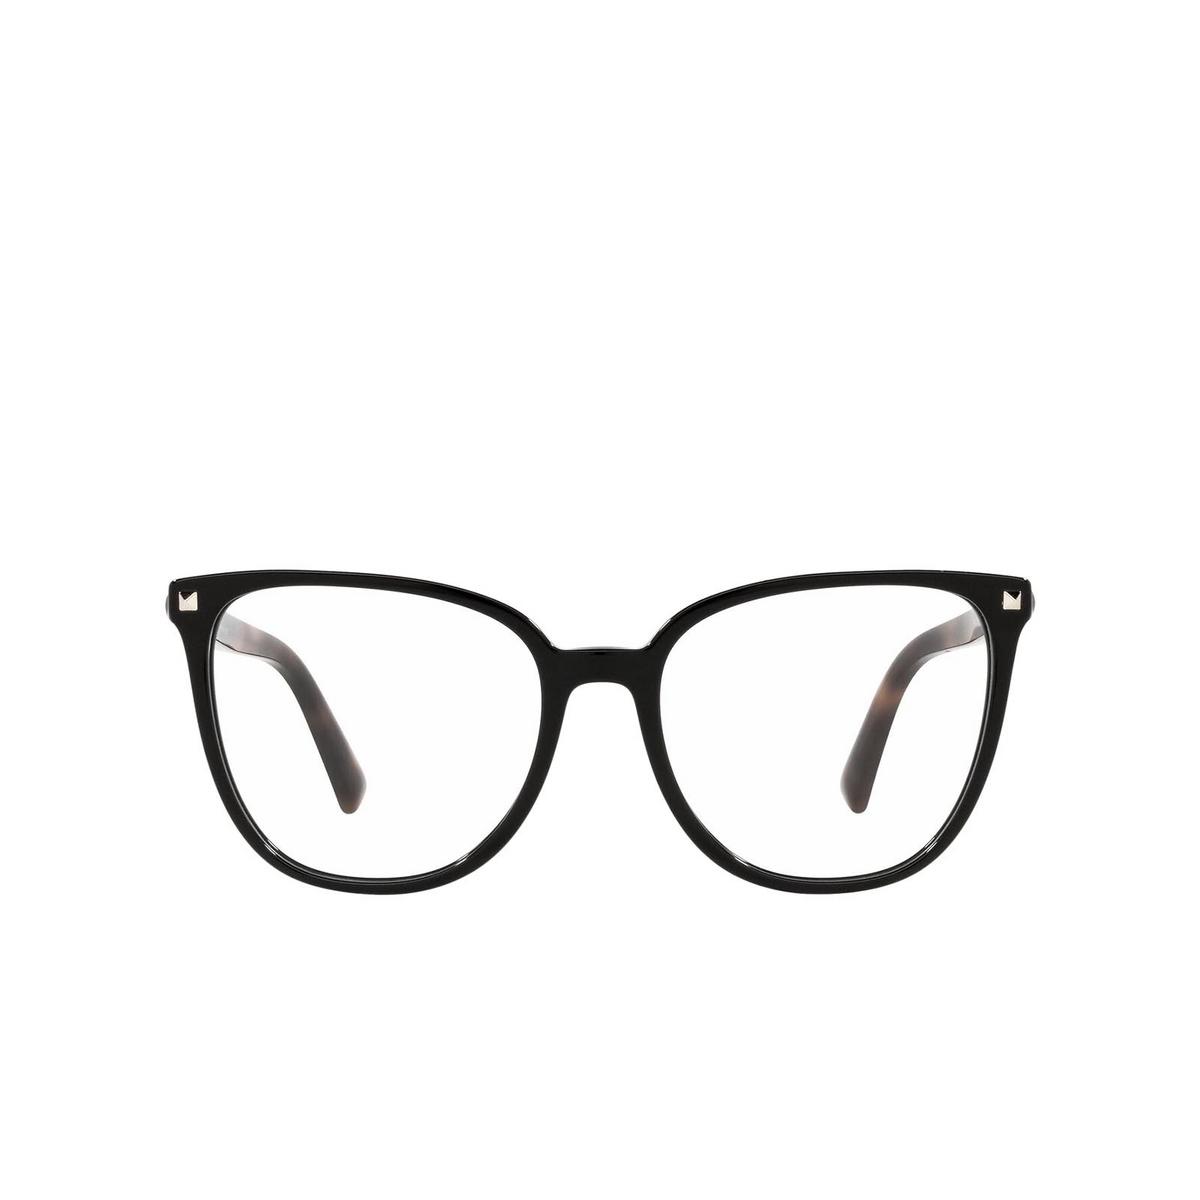 Valentino® Square Eyeglasses: VA3059 color Black 5001 - front view.